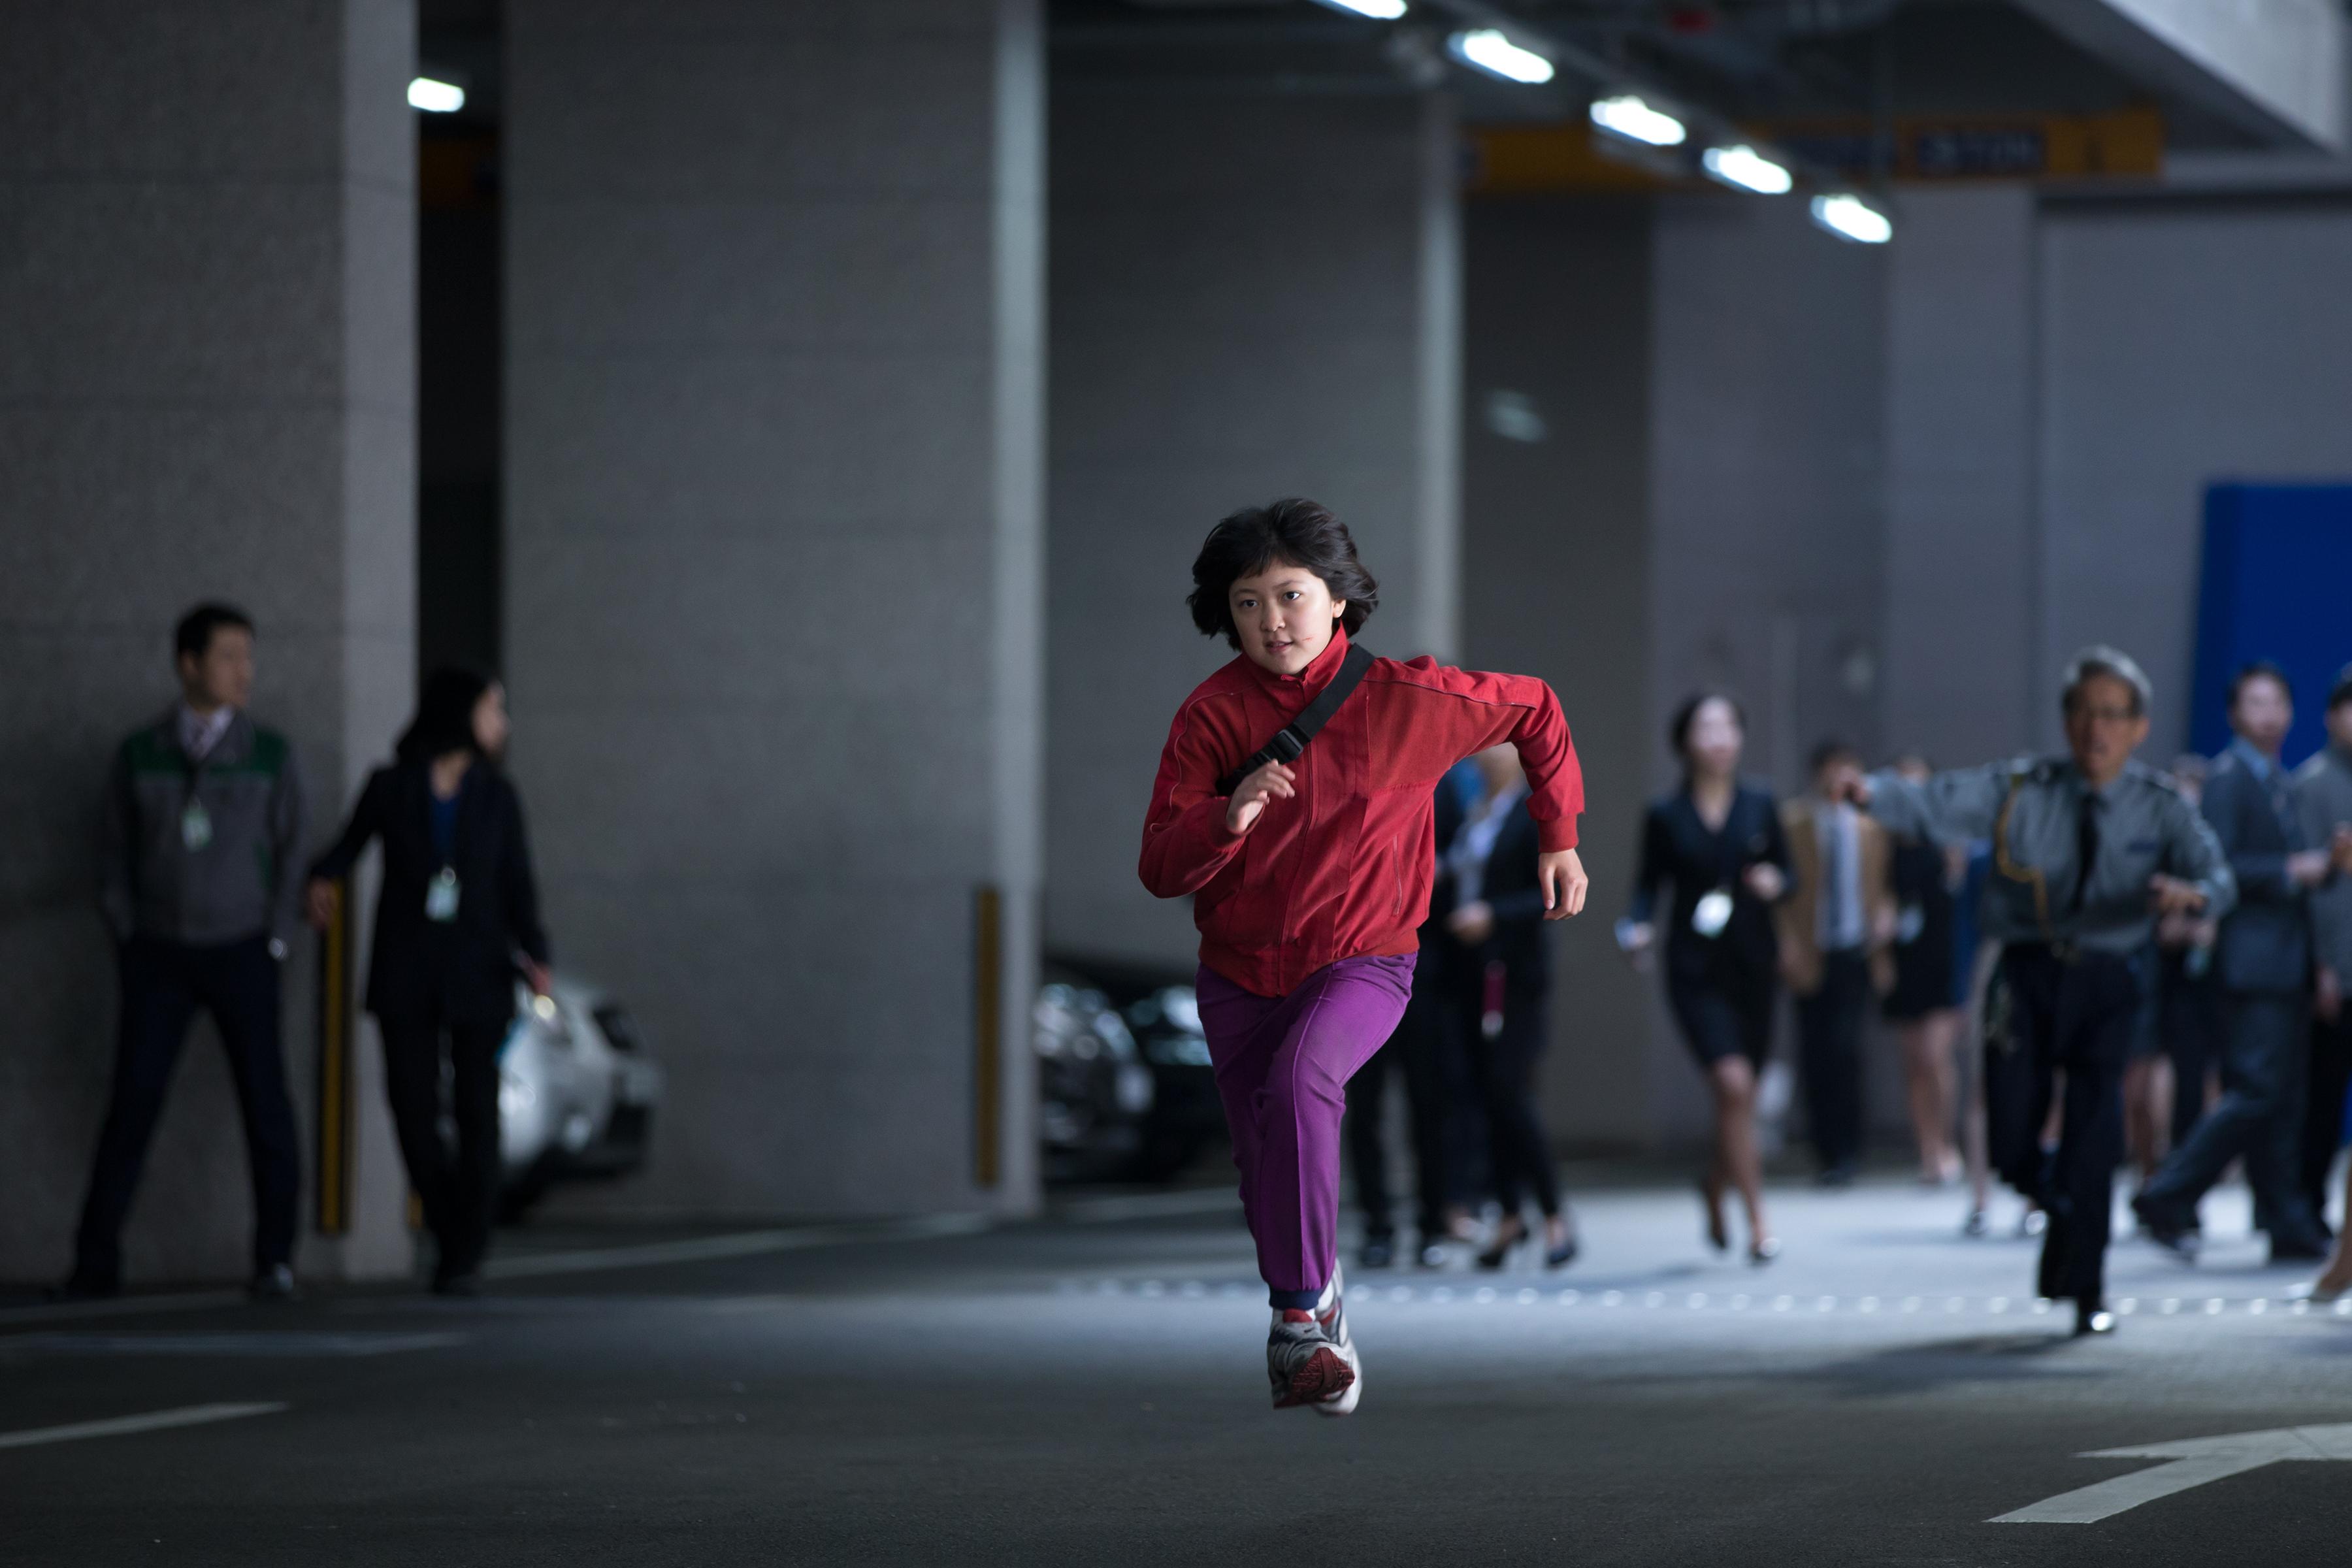 Okja: Ahn Seo-hyun corre tra la folla